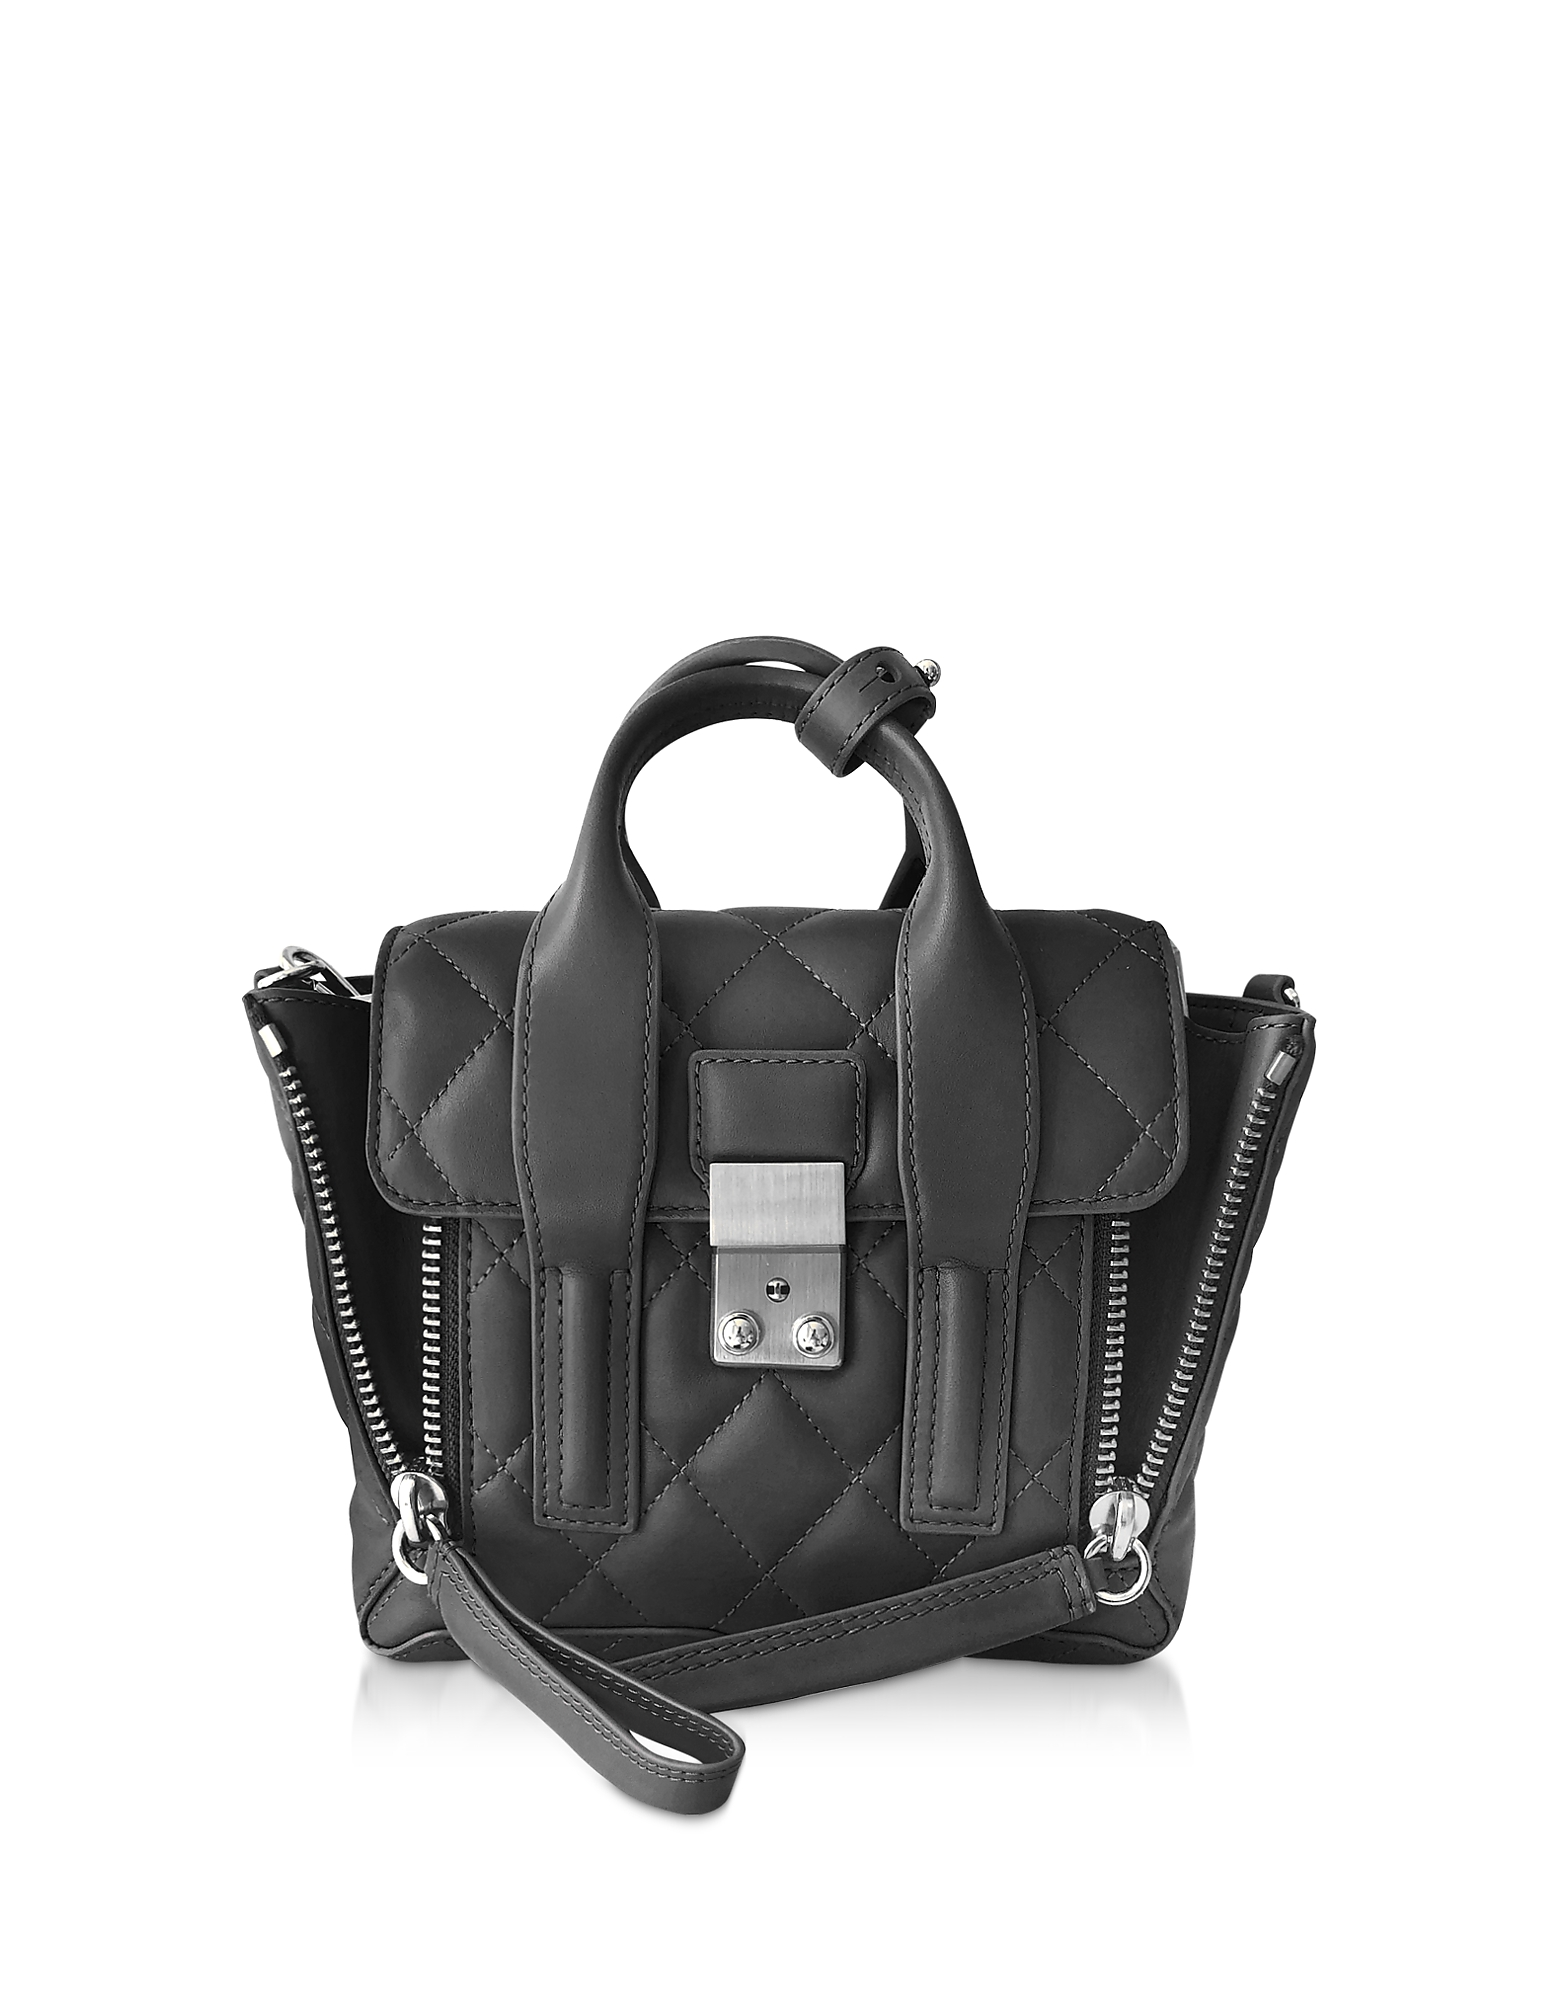 Pashli Quilted Mini Satchel Bag, Black